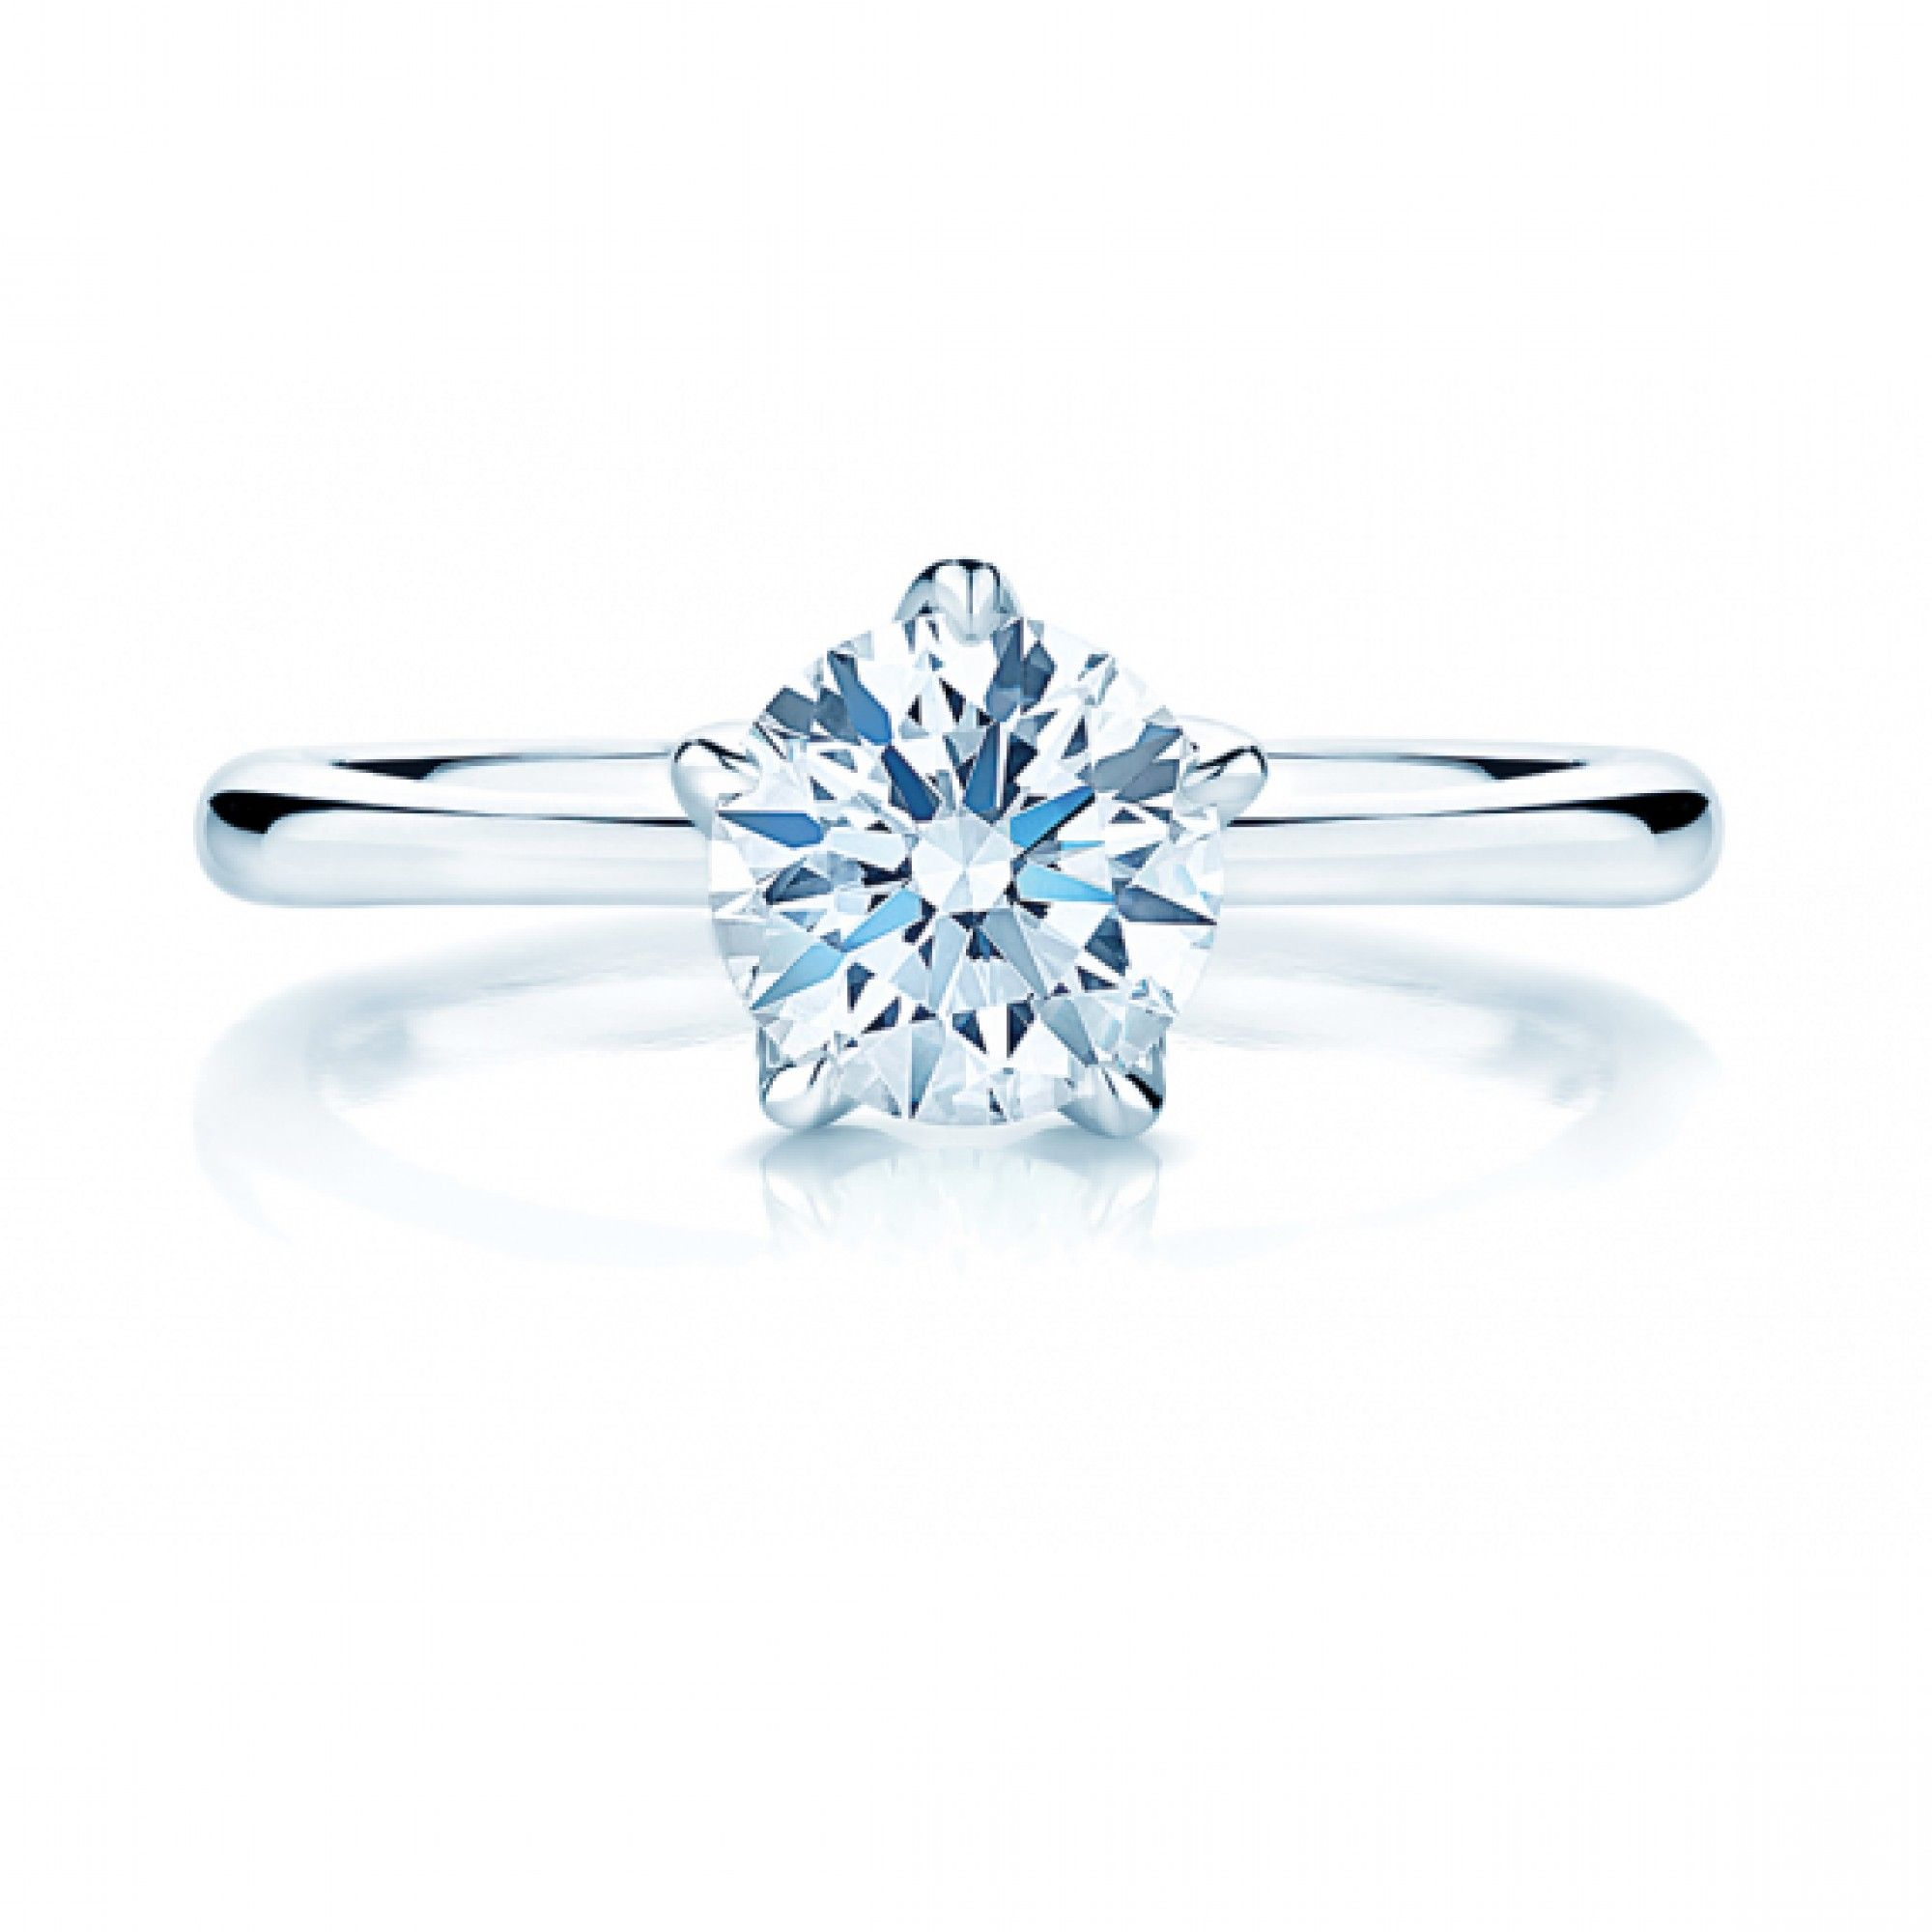 Birks North Star™ Platinum Diamond Engagement Ring